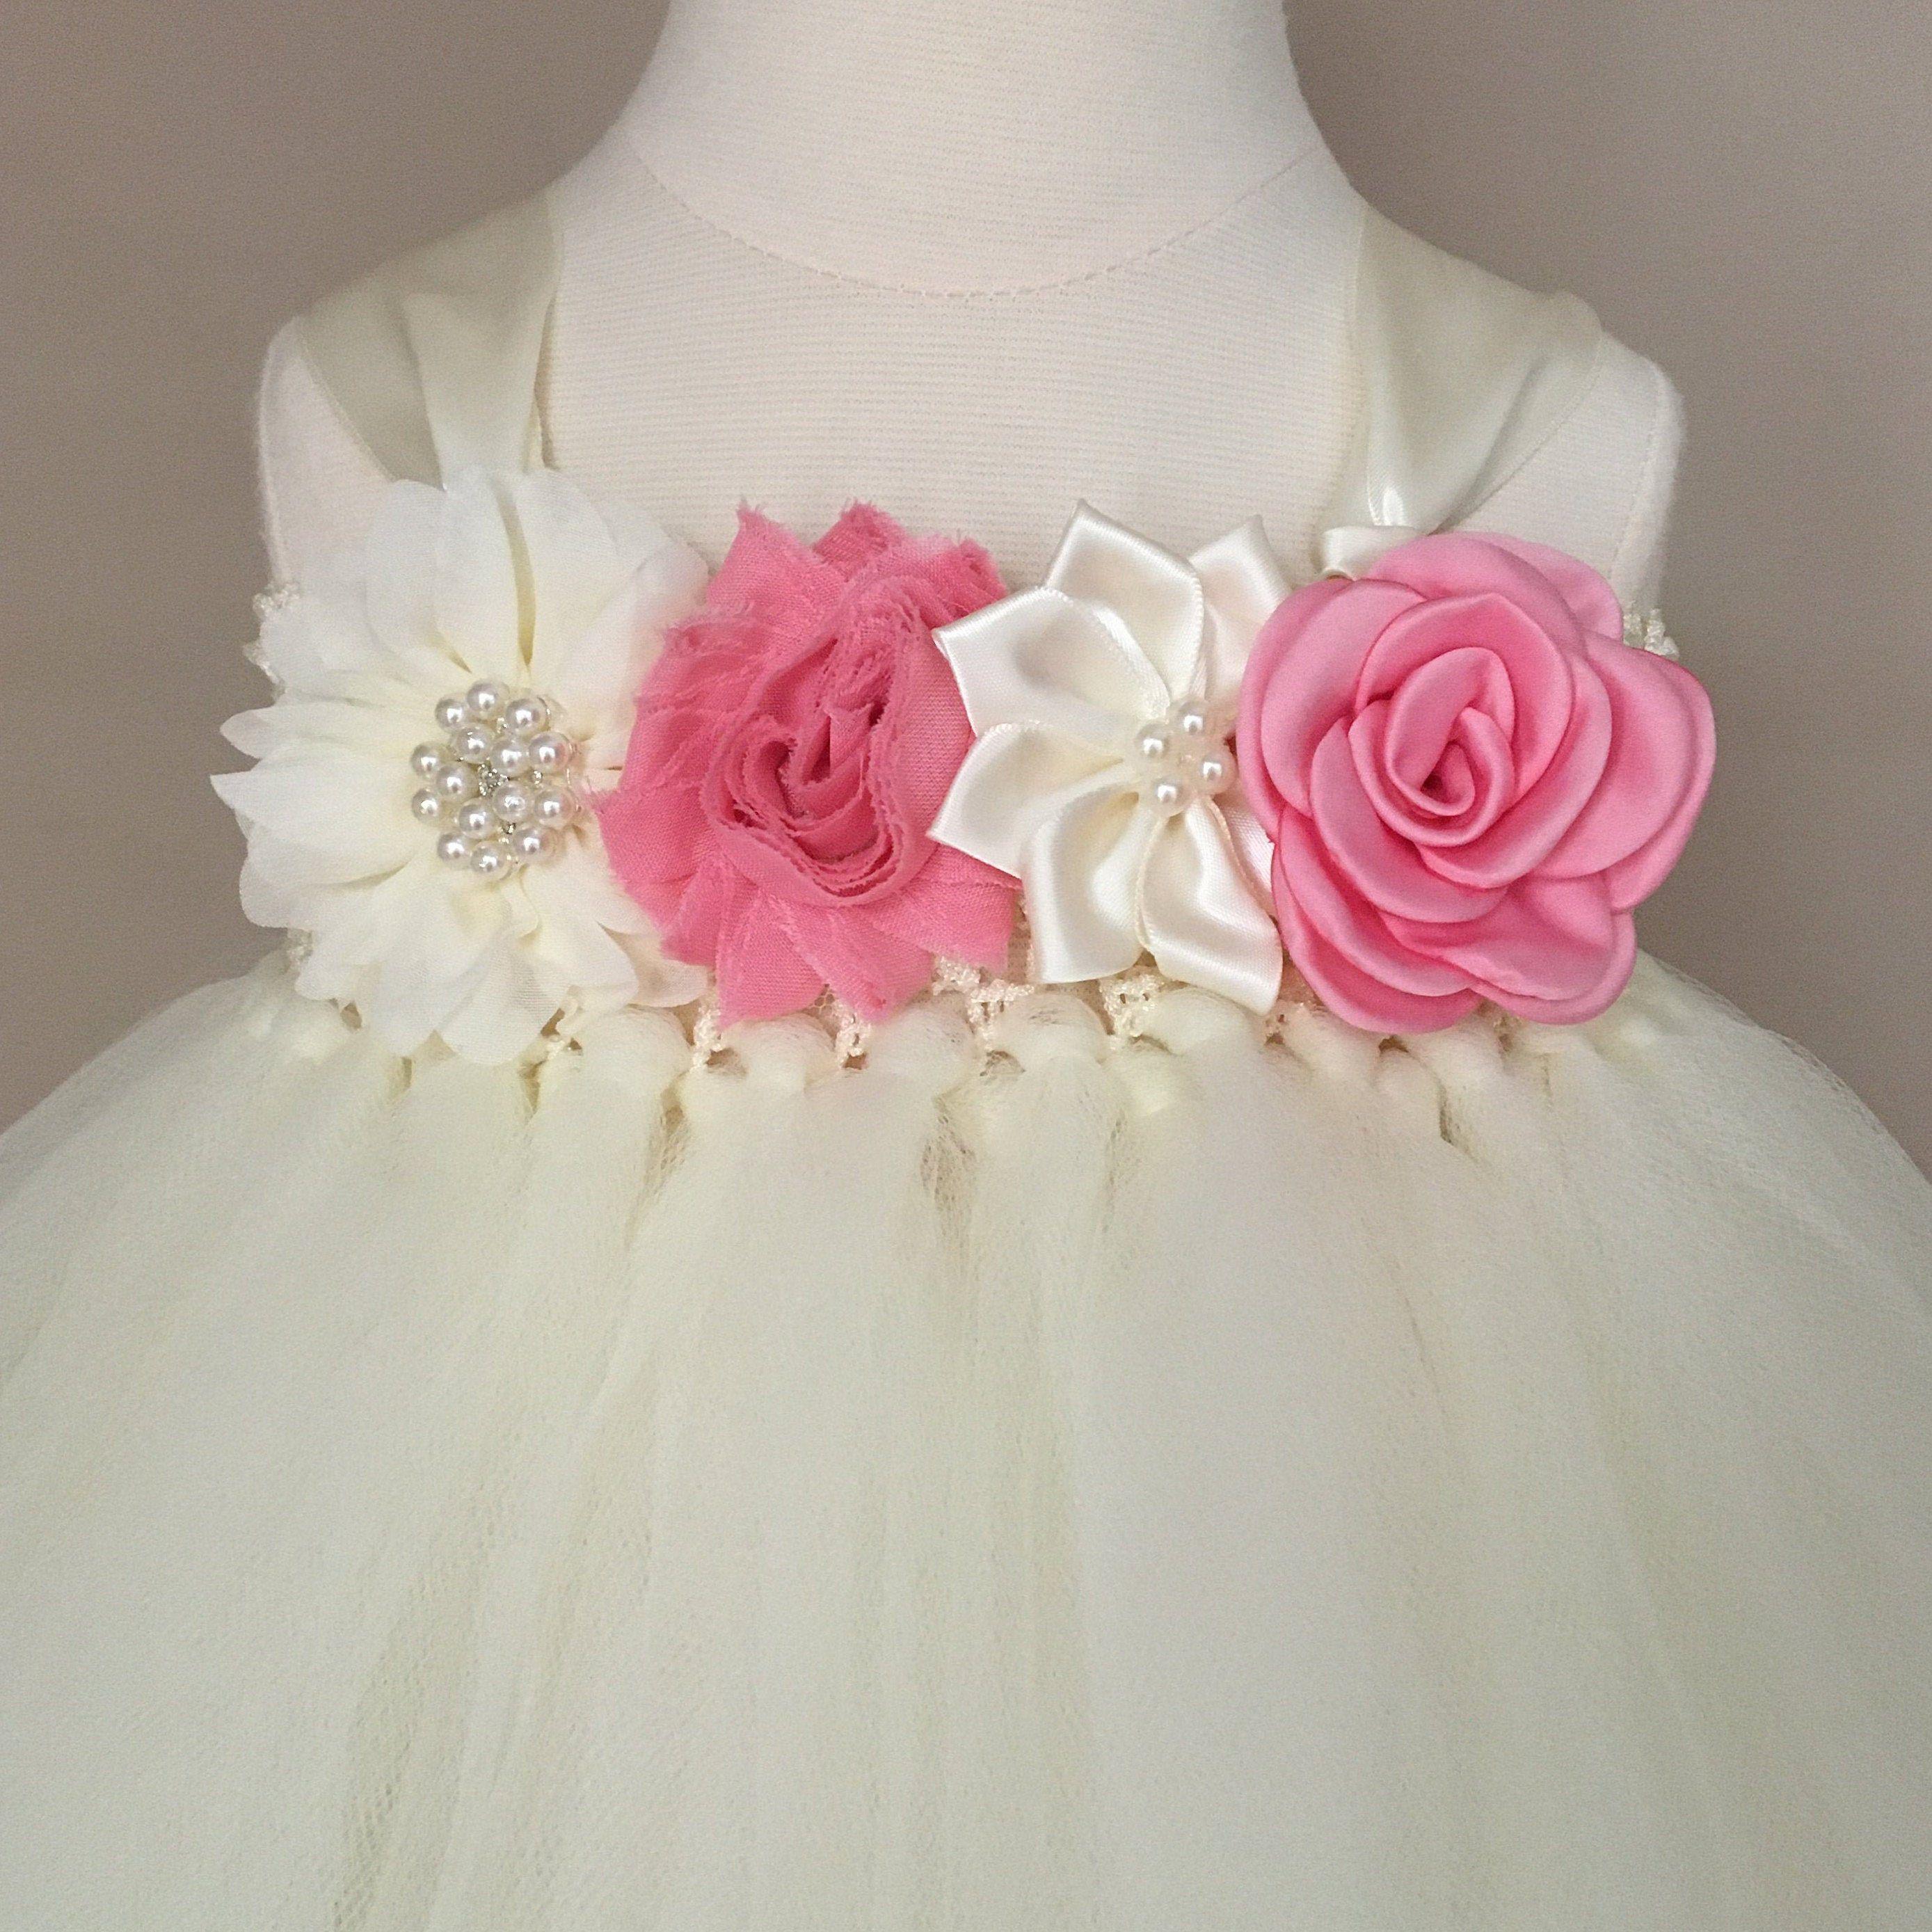 Ivory Flower Girl Dress Pink First Birthday Dress 1 Year Old Princess Girl Dress Gown Tu Pink Flower Girl Dresses Flower Girl Dresses Ivory Flower Girl Dresses